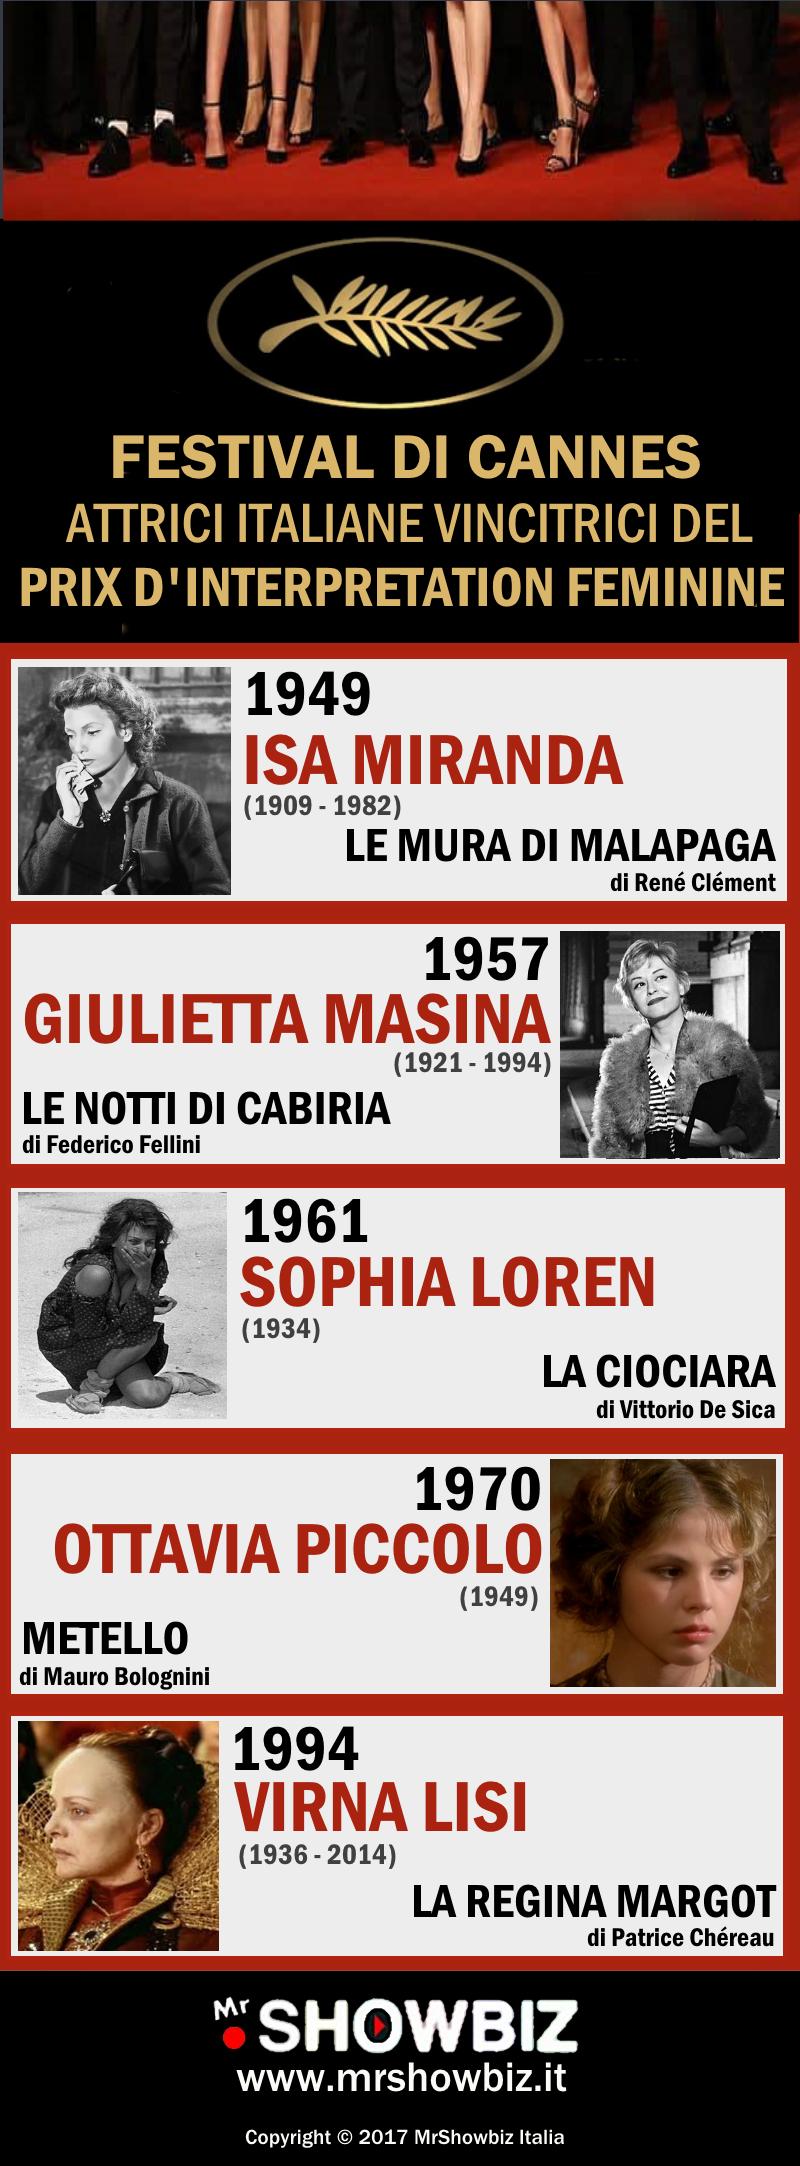 Attrici Italiane Vincitrici del Prix d'Intérpretation Féminine al Festival di Cannes